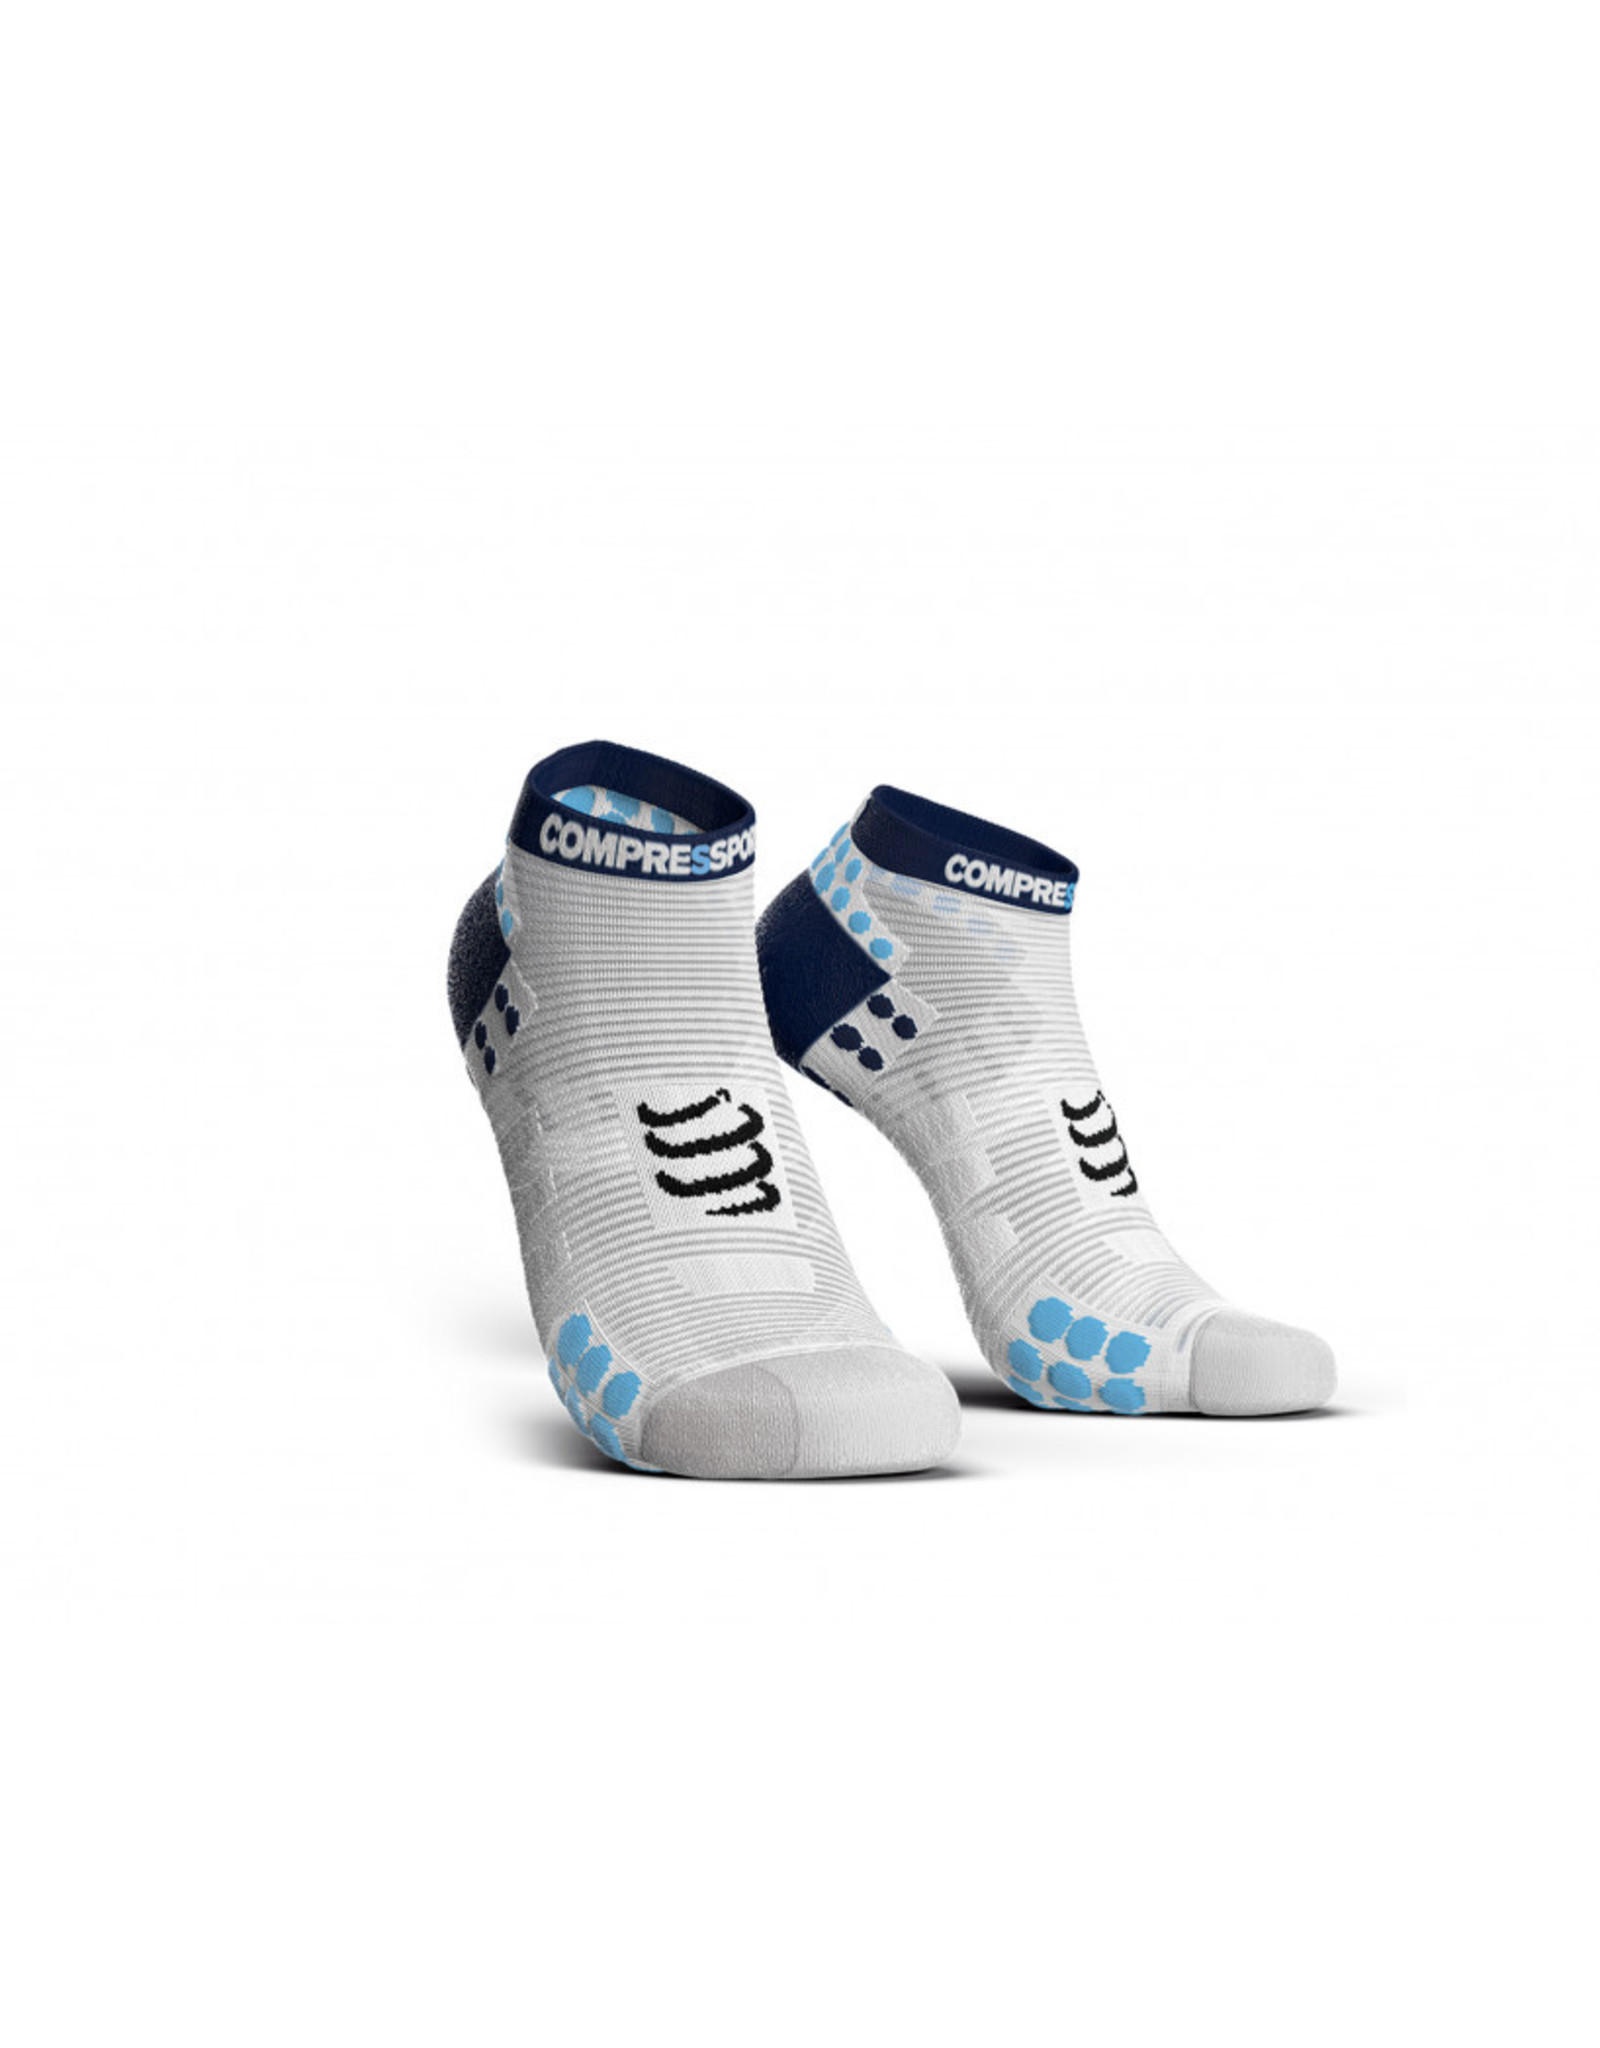 Compressport Pro Racing Socks V3.0 Run Low Chaussettes De Running Bas - Blanc/Bleu